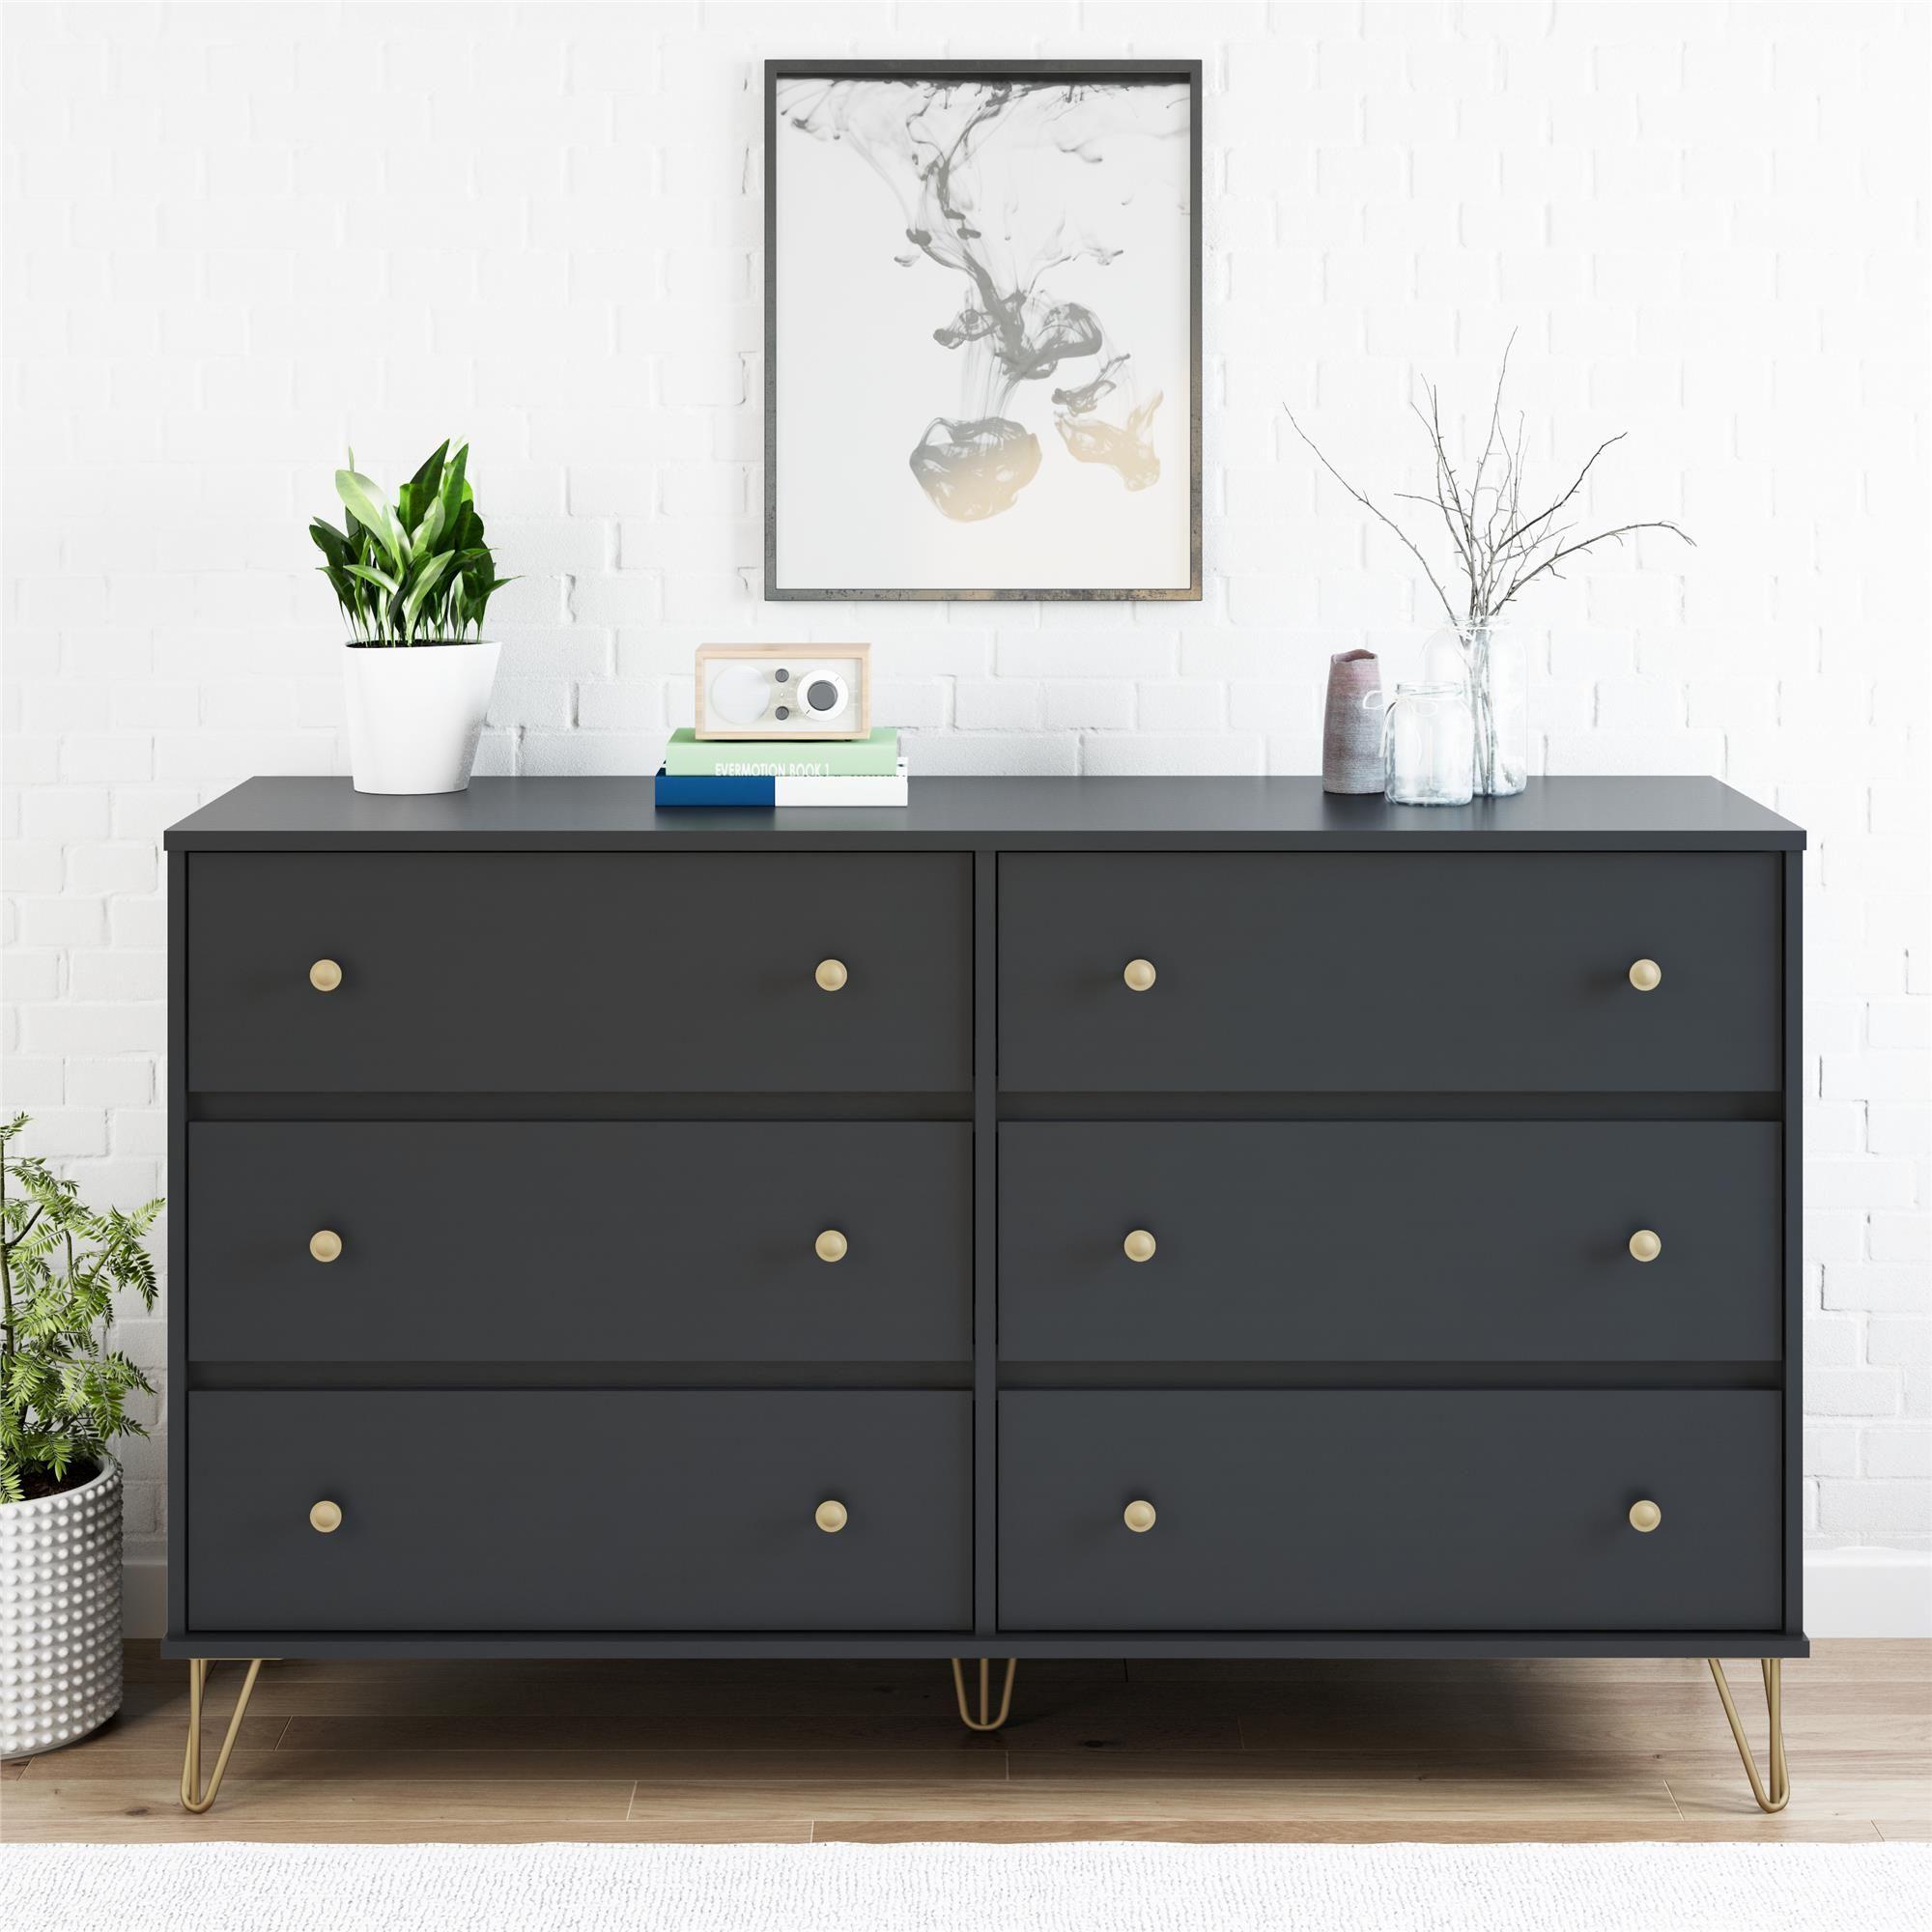 Home In 2020 6 Drawer Dresser Dresser Drawers Six Drawer Dresser